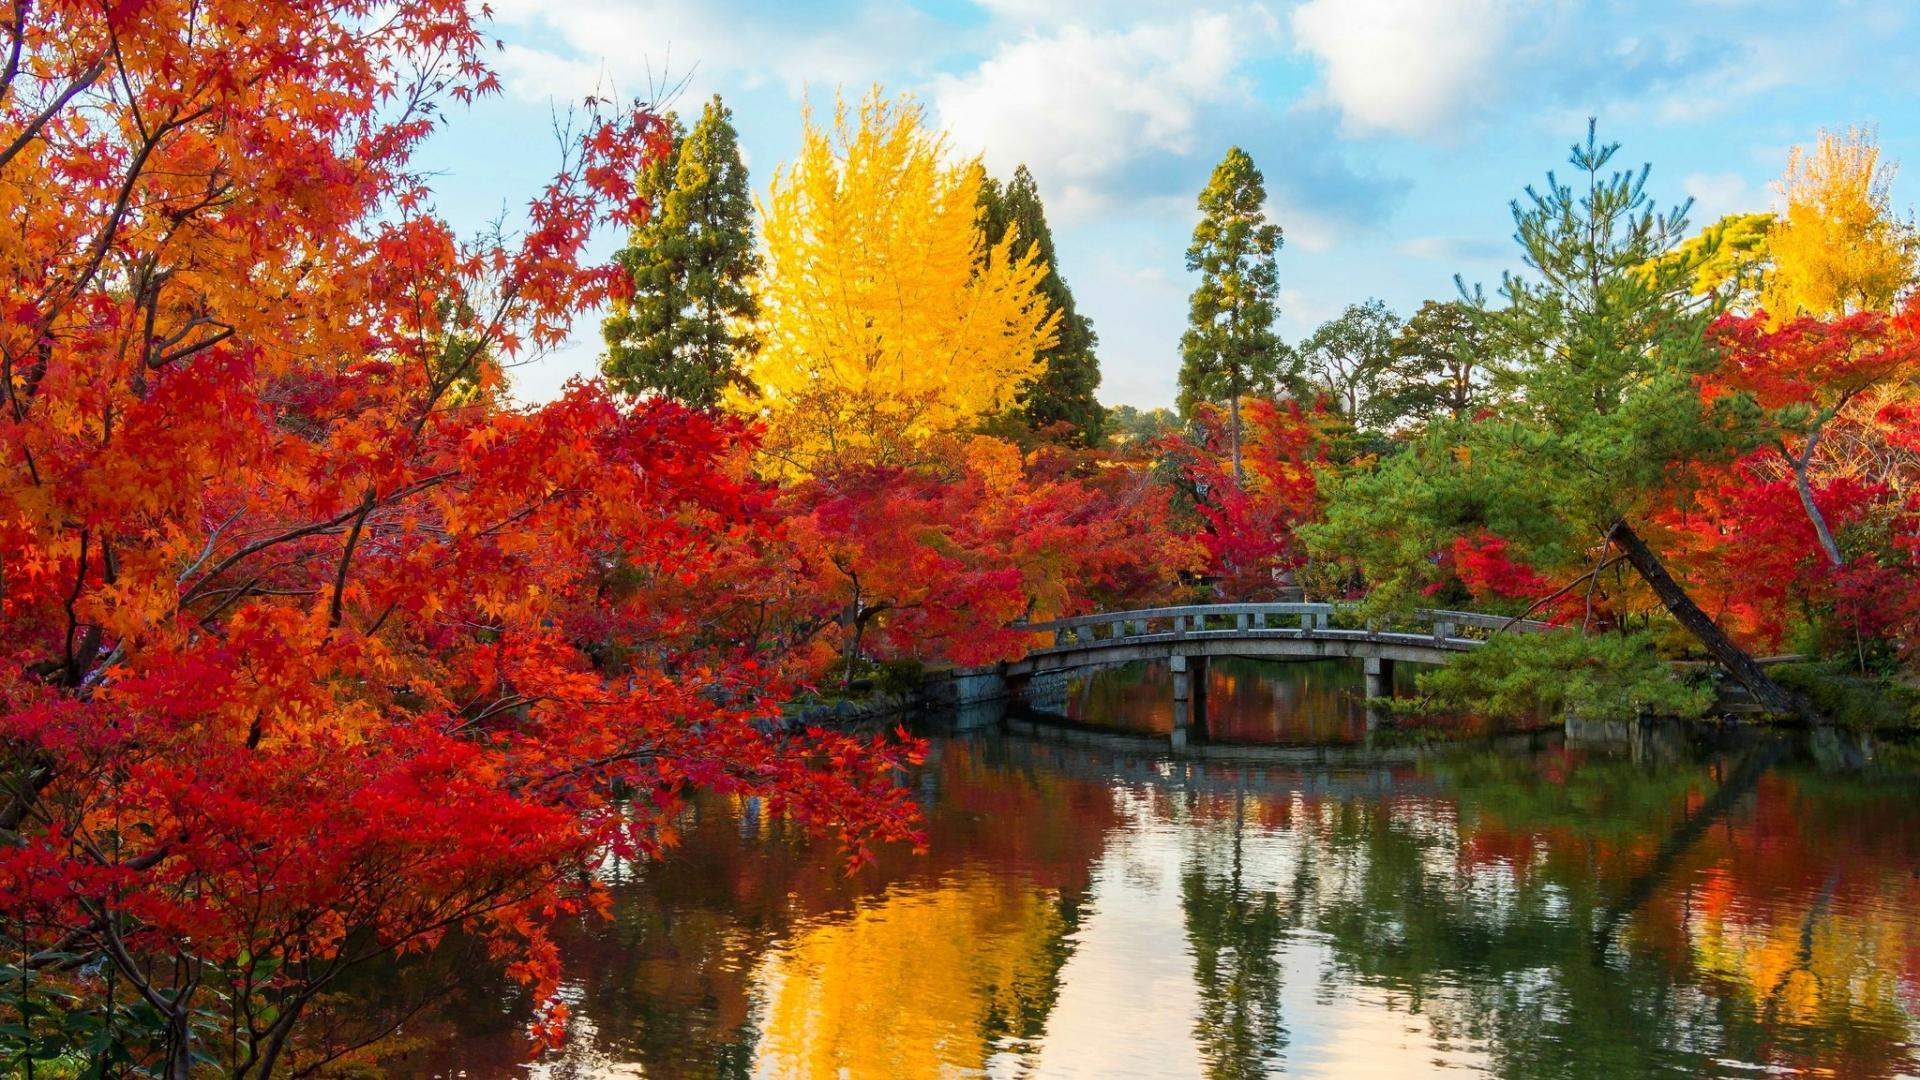 autumn park wallpaper 1920x1080 - photo #16